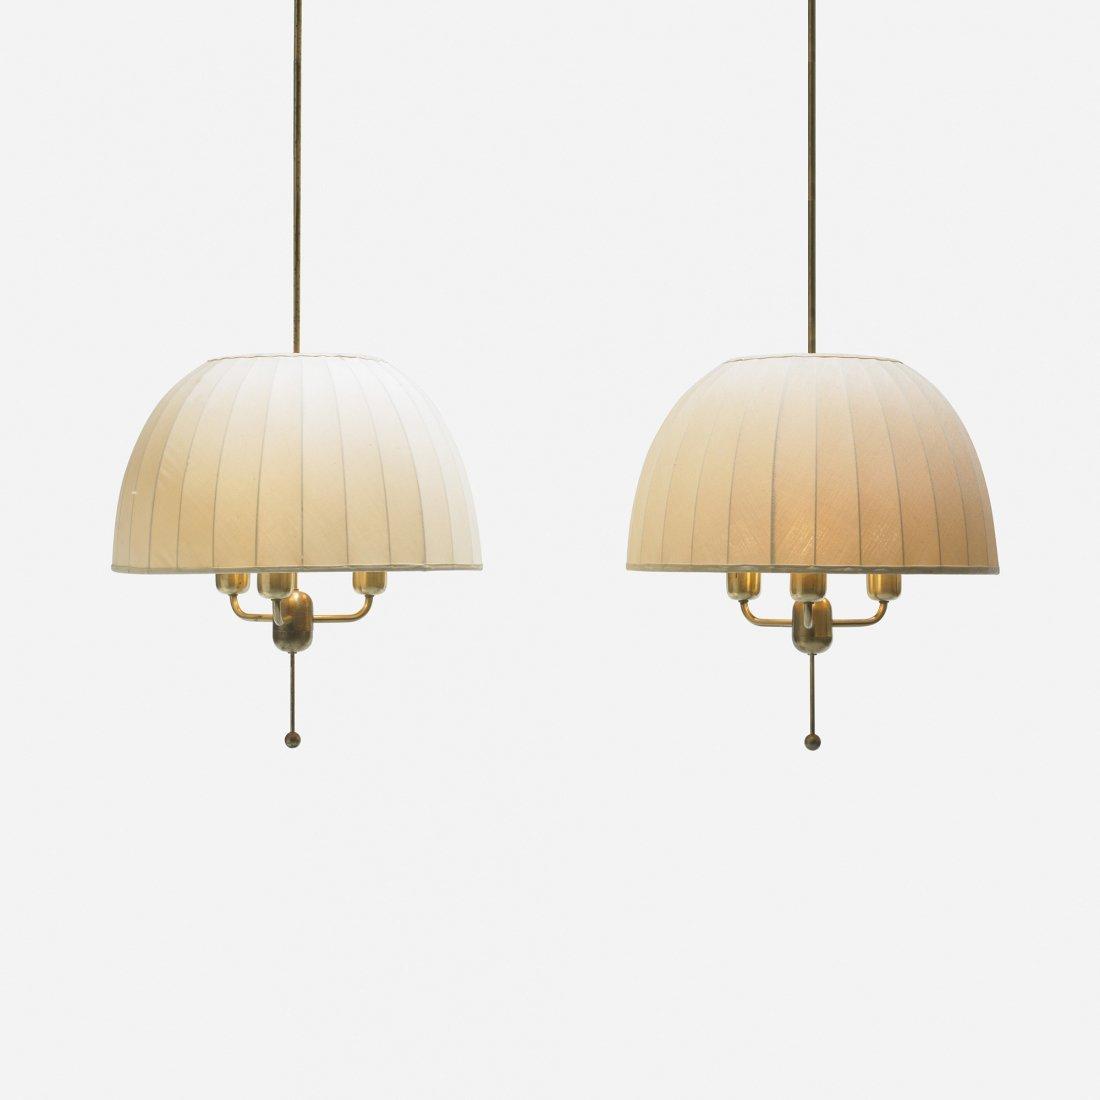 100: Hans-Agne Jakobsson chandeliers, pair